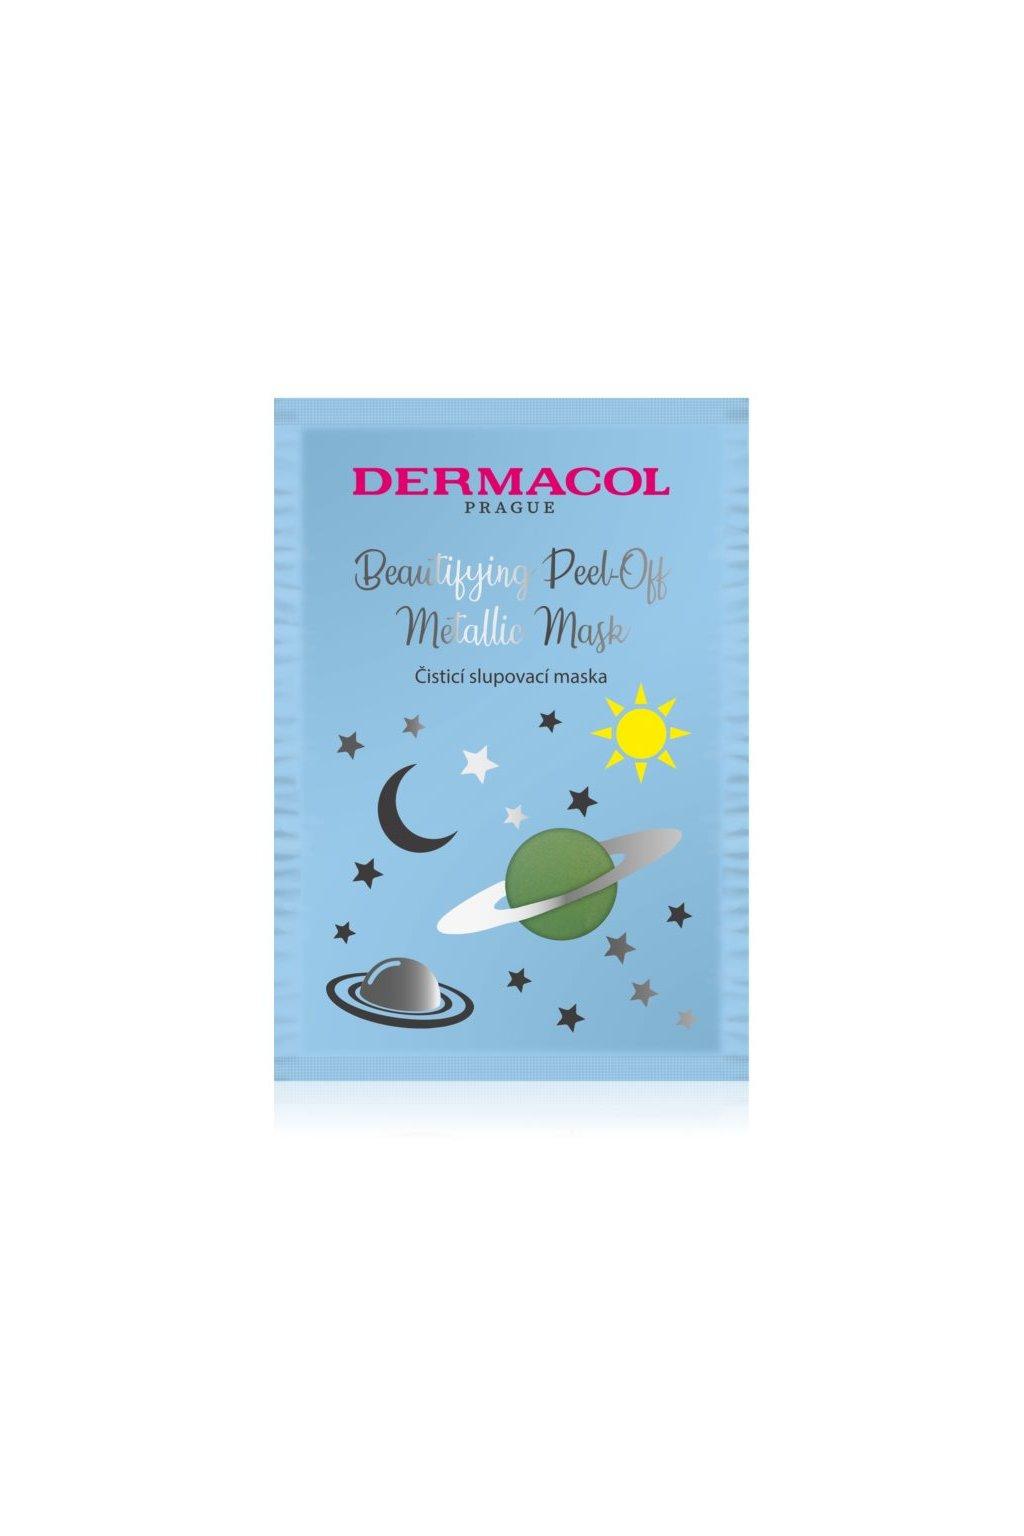 dermacol beautifying peel off metallic mask slupovaci maska pro hloubkove cisteni